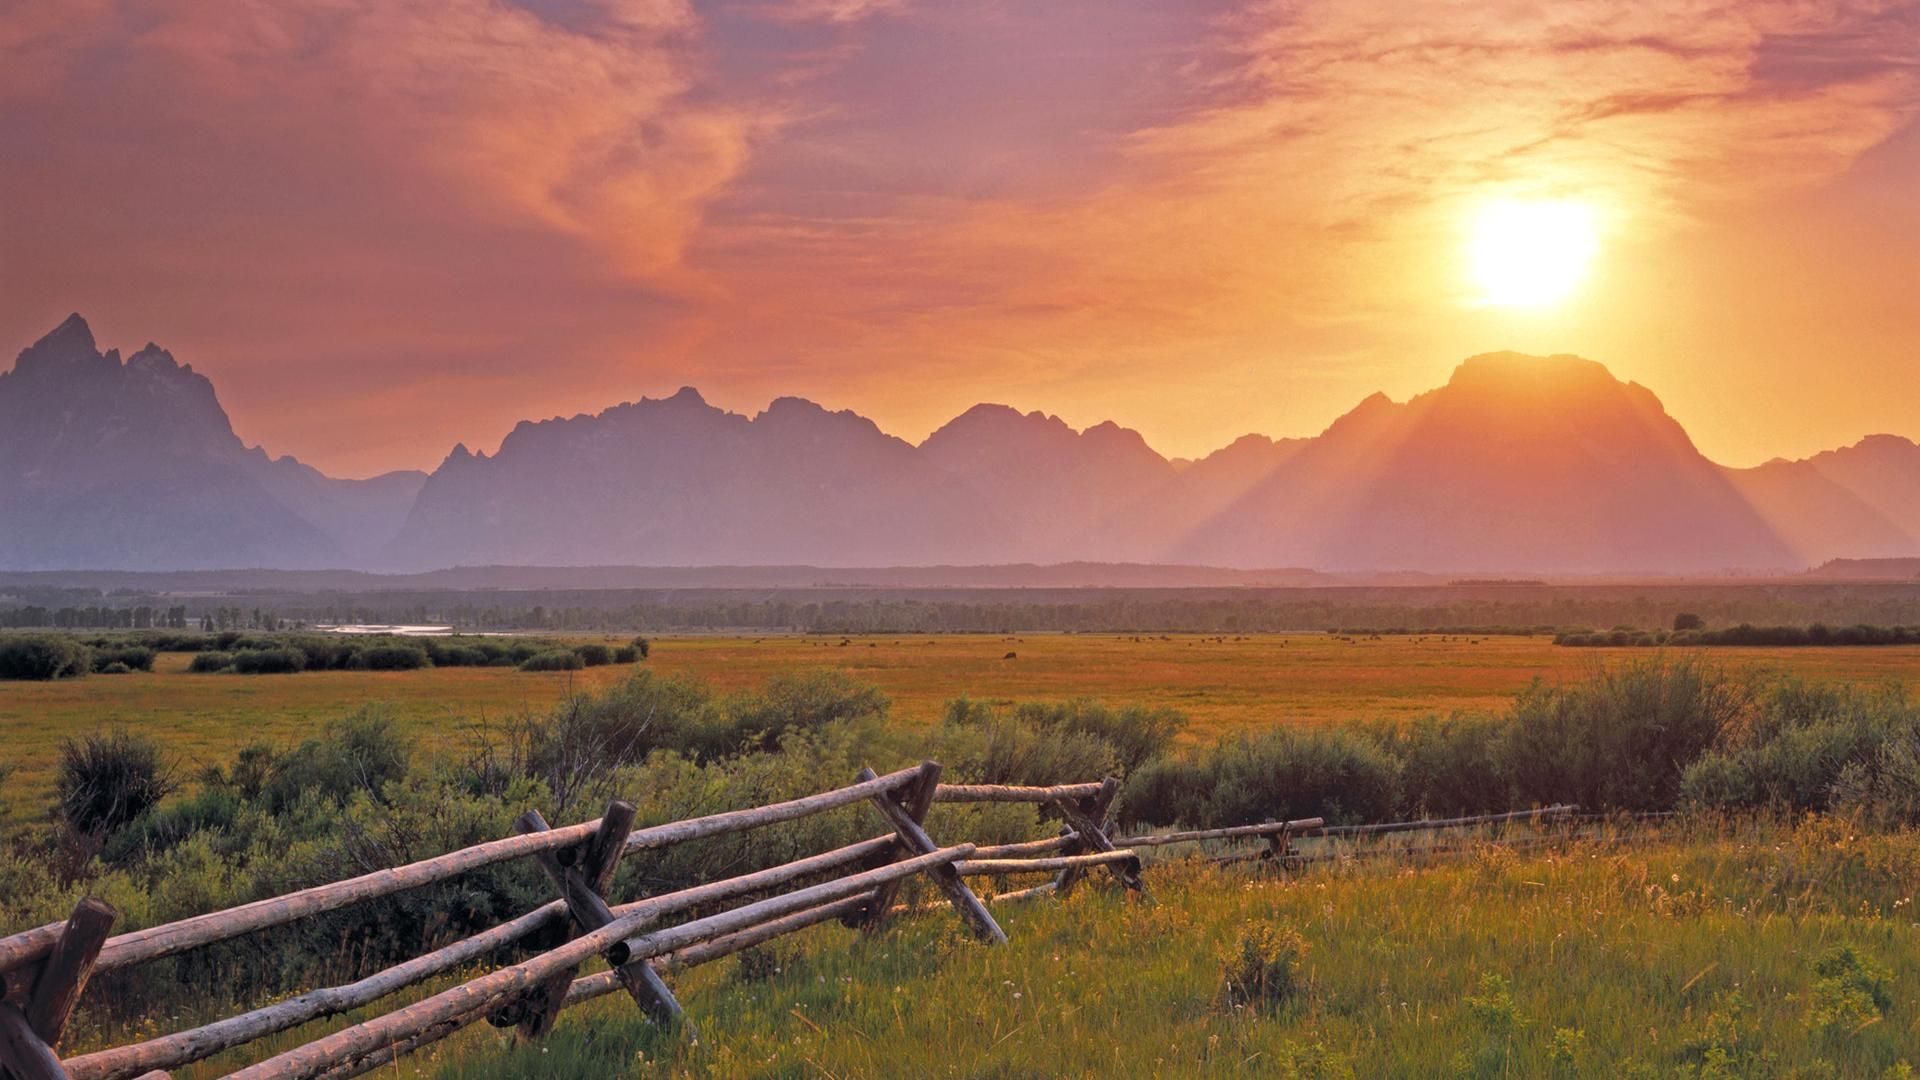 Grassland sunrise scenery desktop backgrounds wide wallpapers 1920x1080